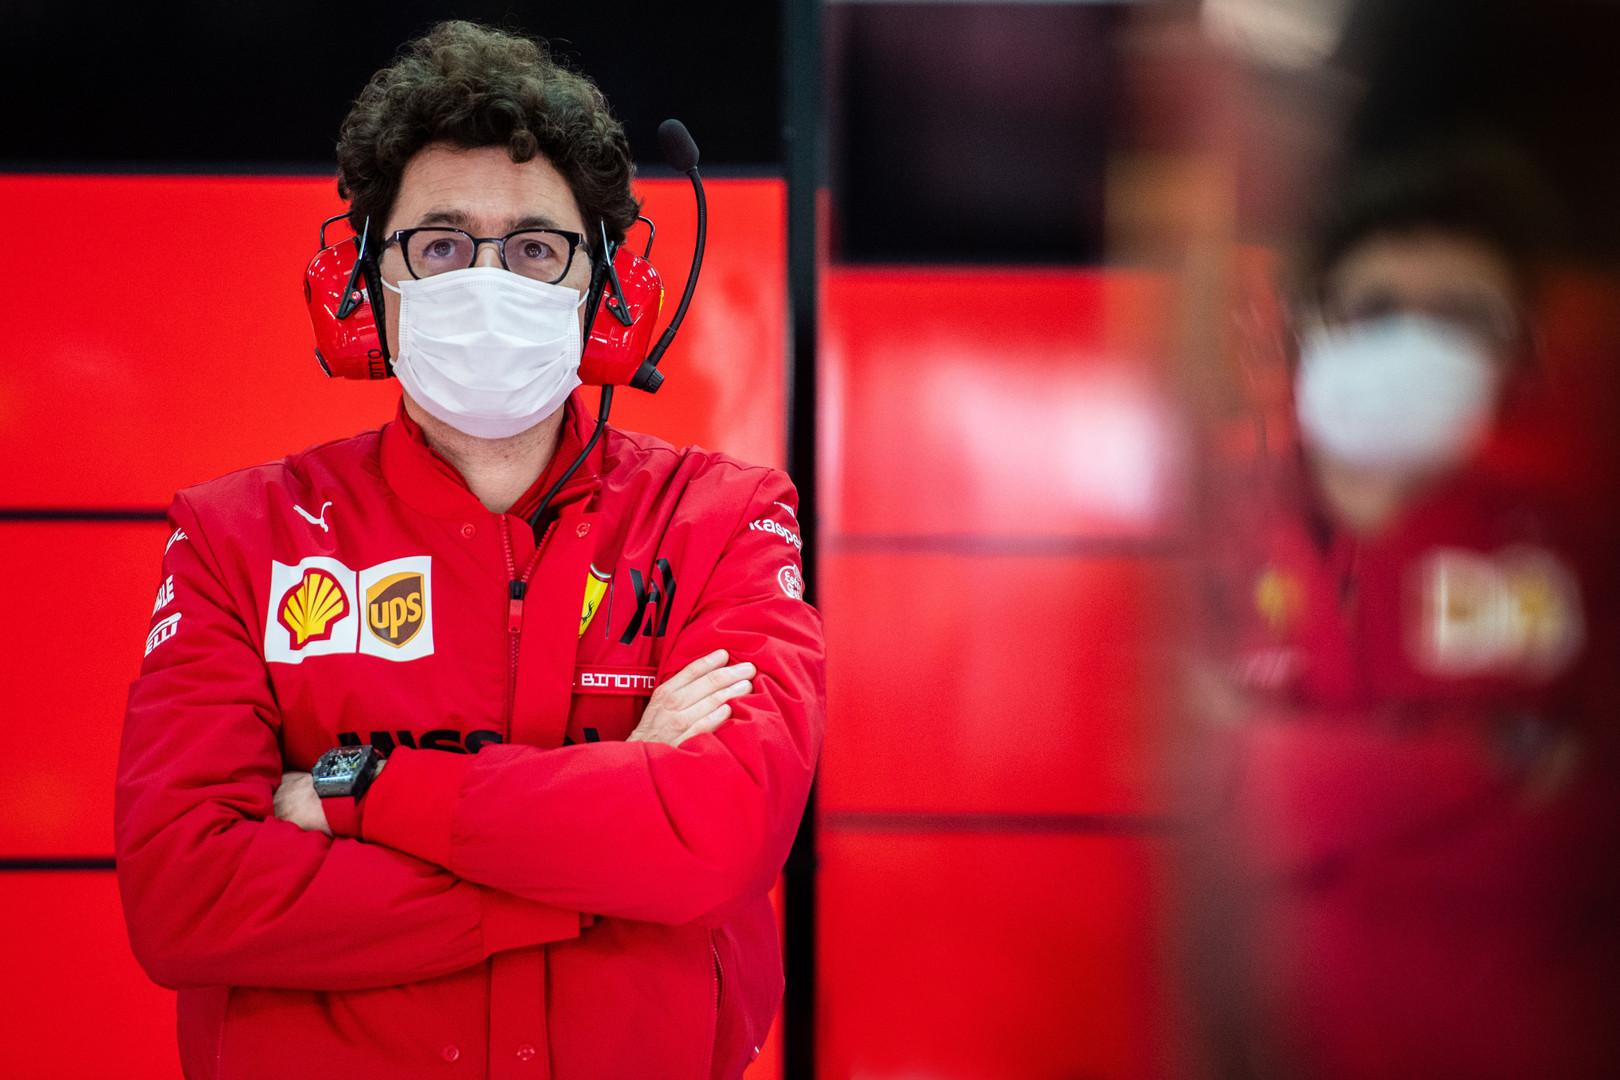 'Unhappy' Binotto proves Ferrari going 'in the right direction'